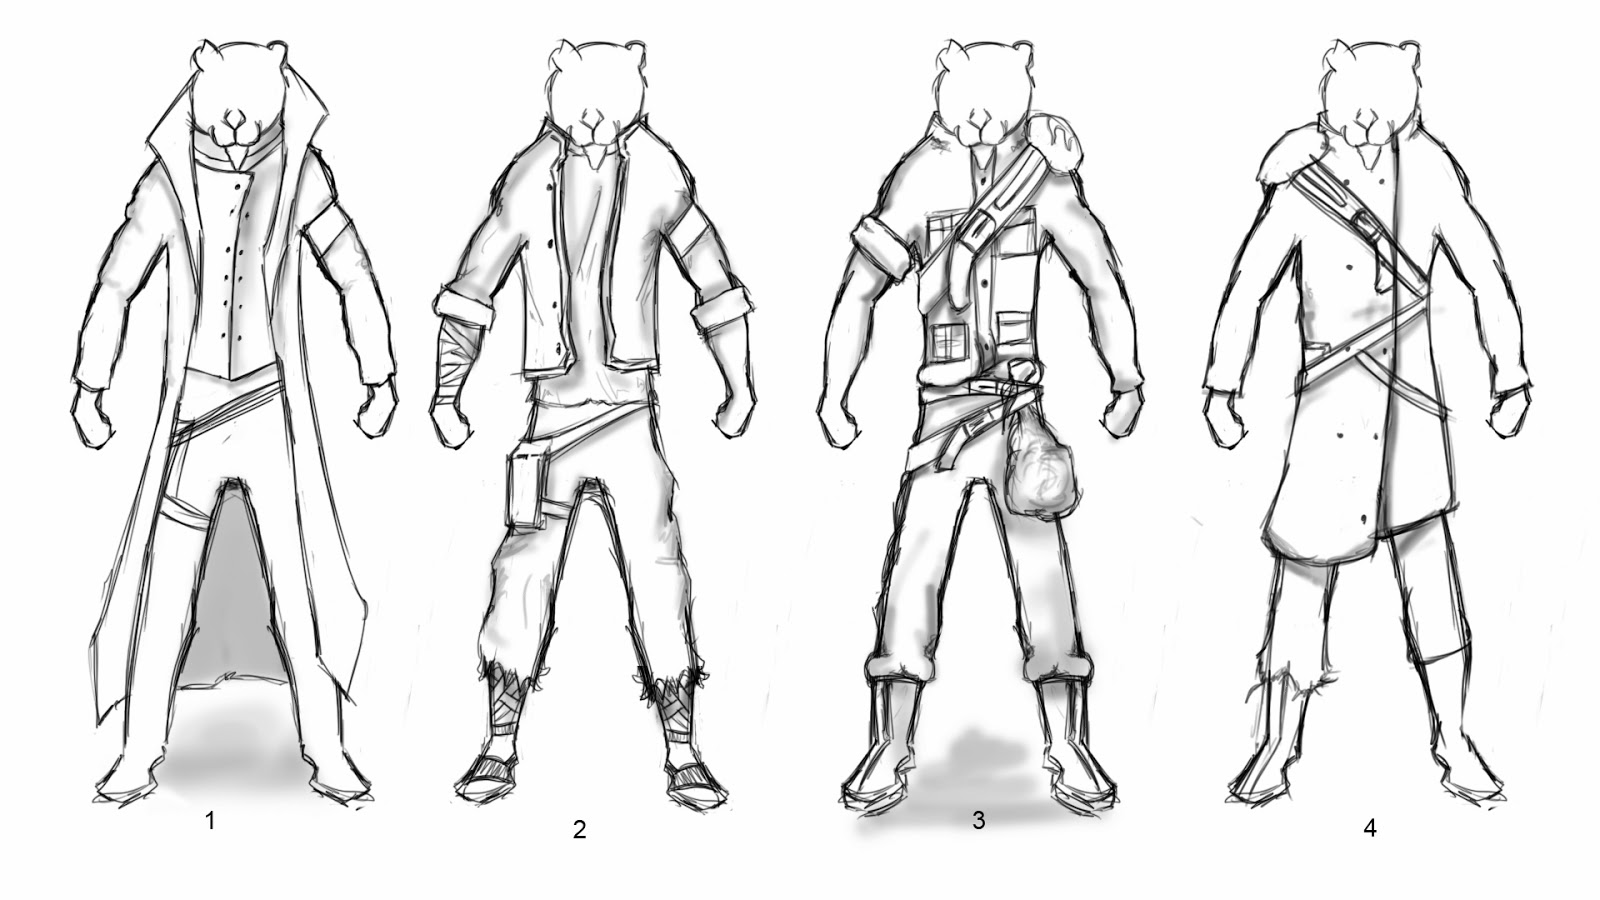 character design post - photo #30